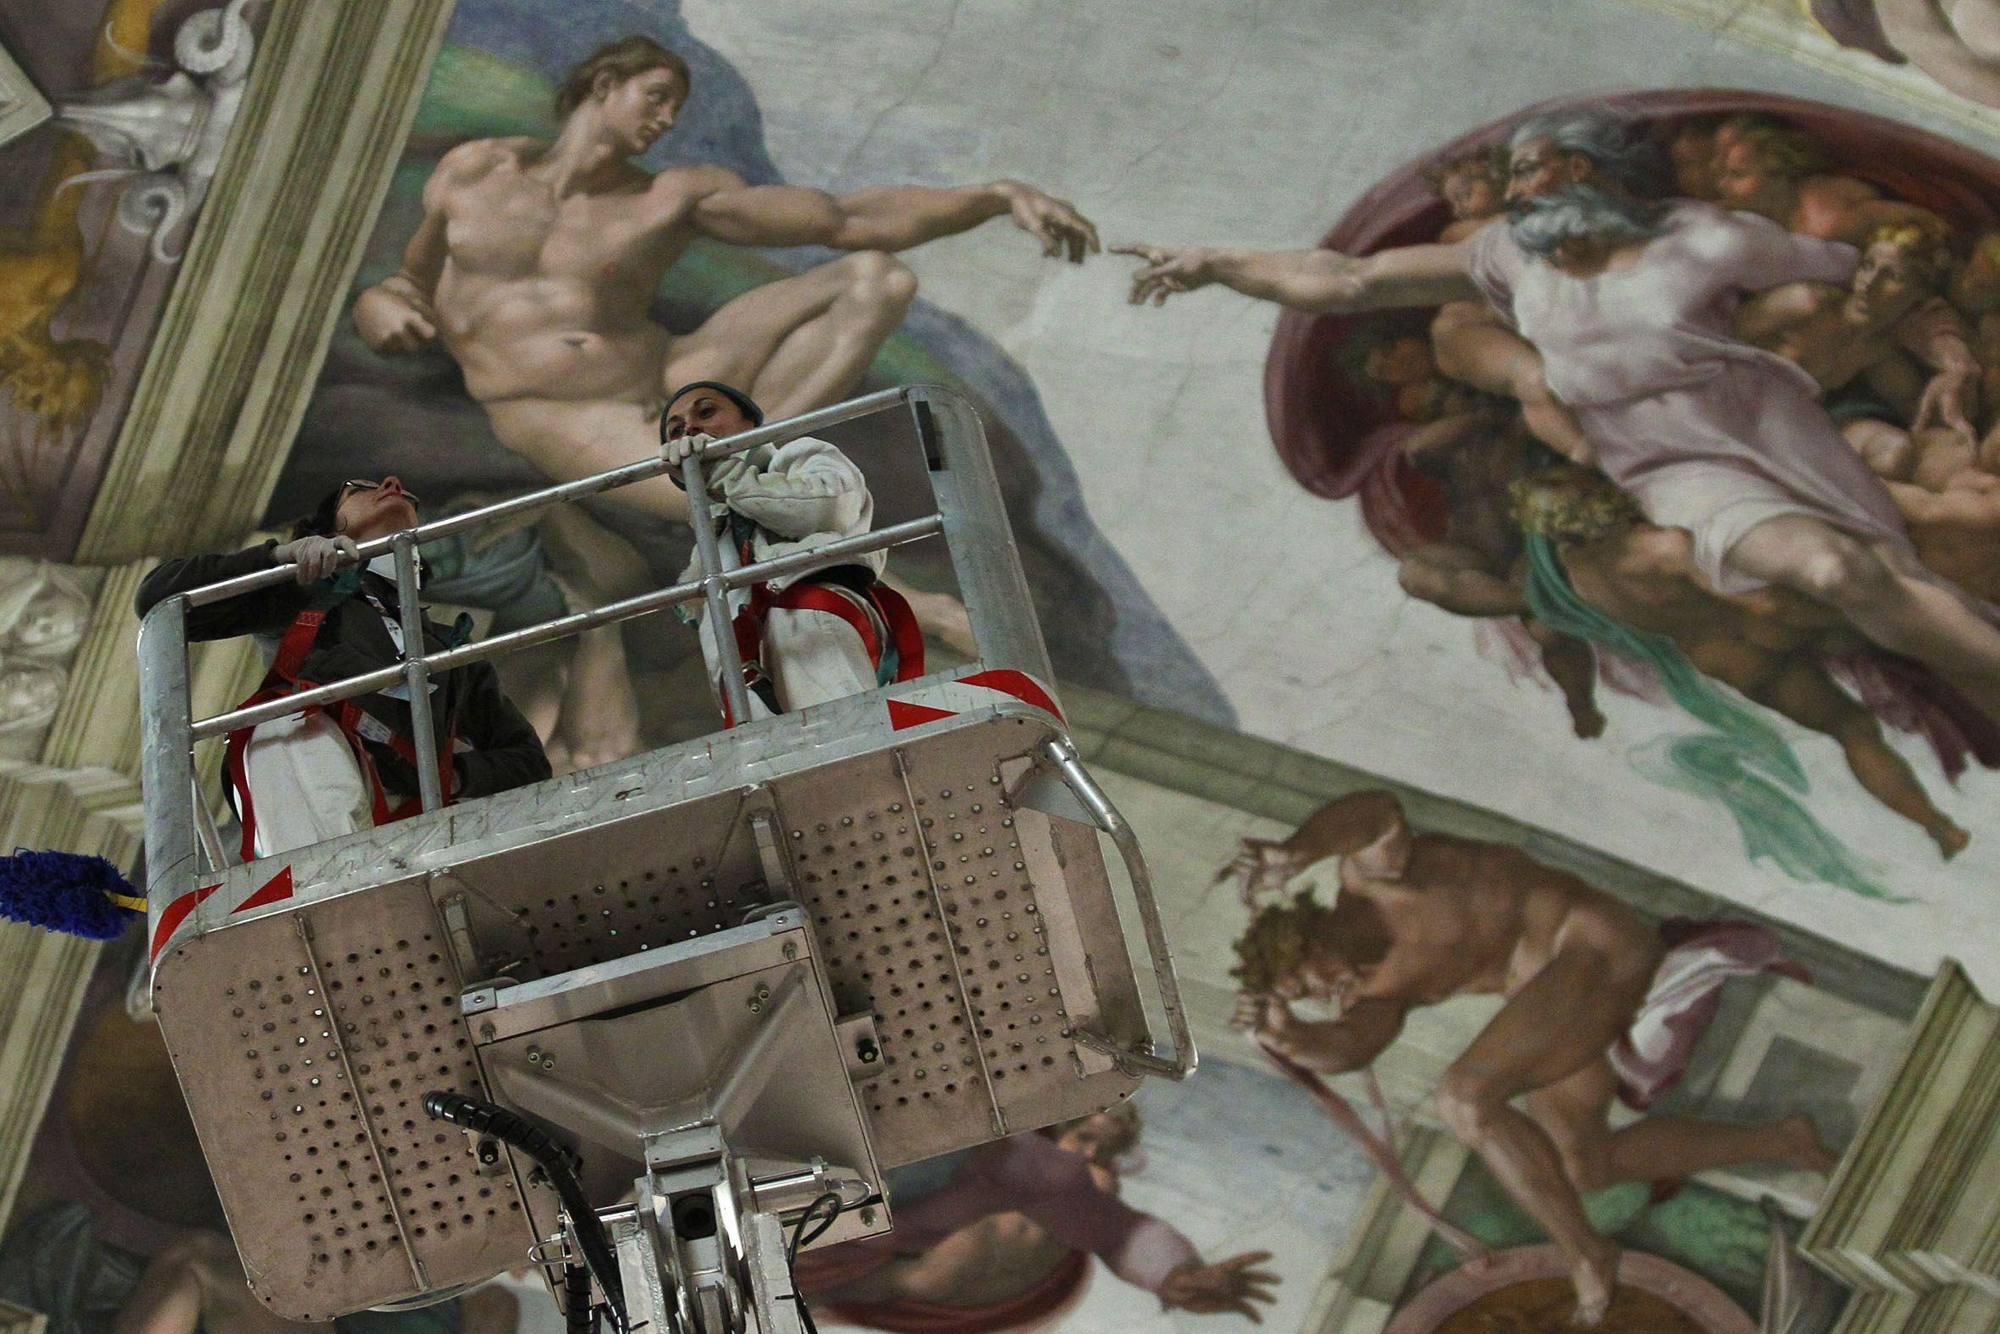 (foto Benvegnù-Guaitoli © Musei Vaticani - Tutti i diritti riservati)